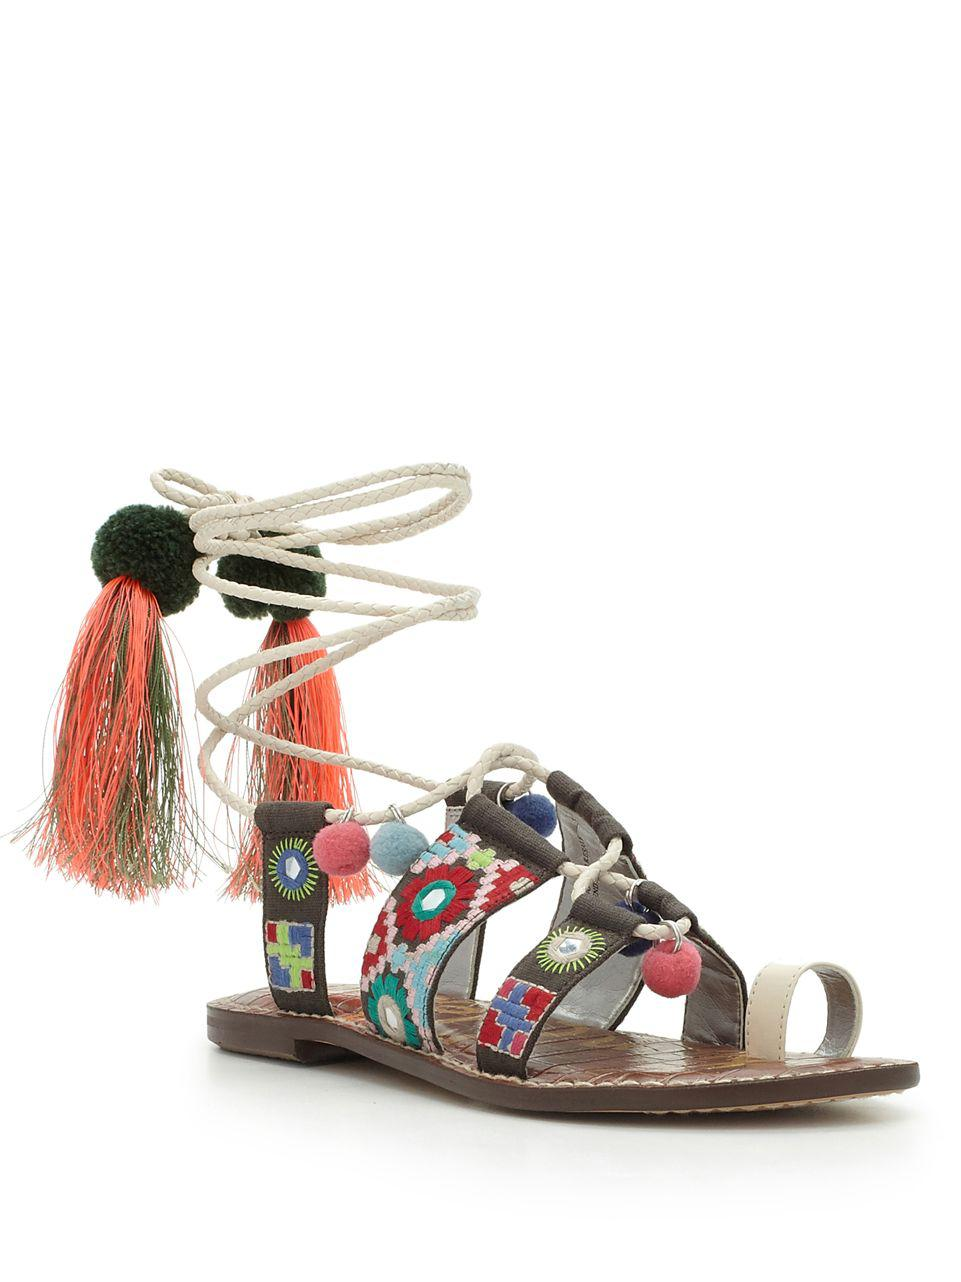 5665e448a8b Lyst - Sam Edelman Gretchen Leather Toe-ring Sandals in White